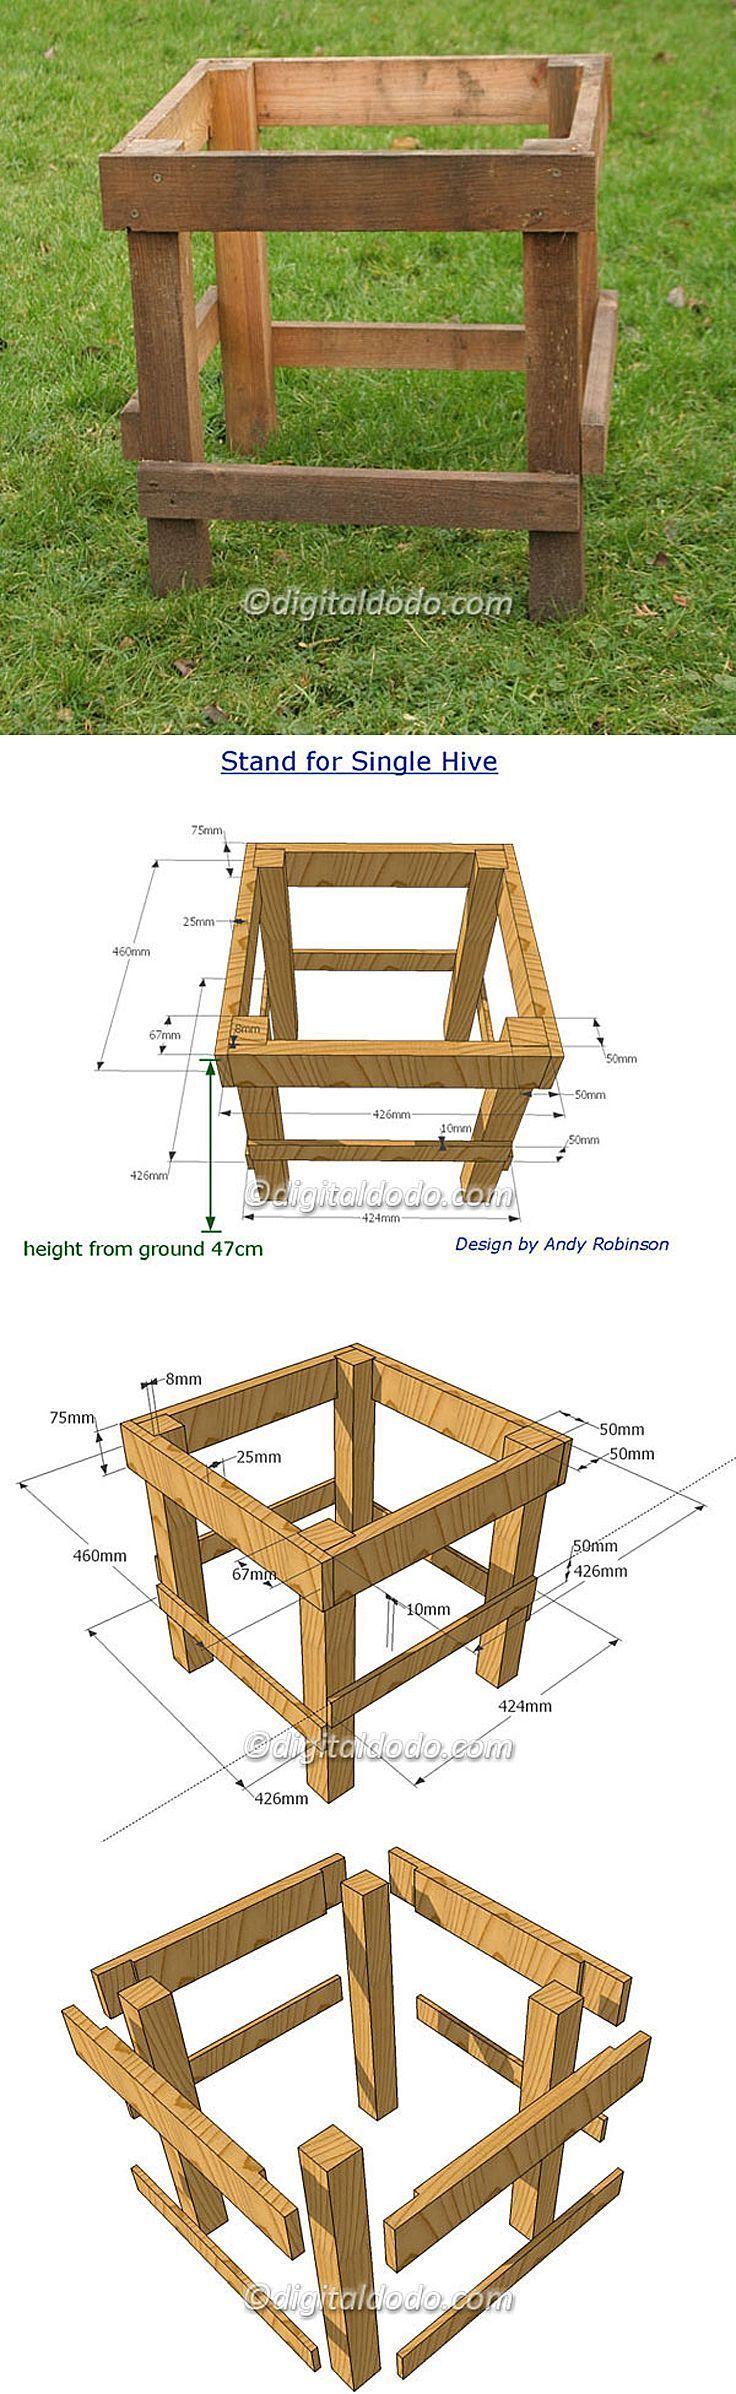 beekeeping hive stand with dimensions bienen halten pinterest bienen halten und bienen. Black Bedroom Furniture Sets. Home Design Ideas